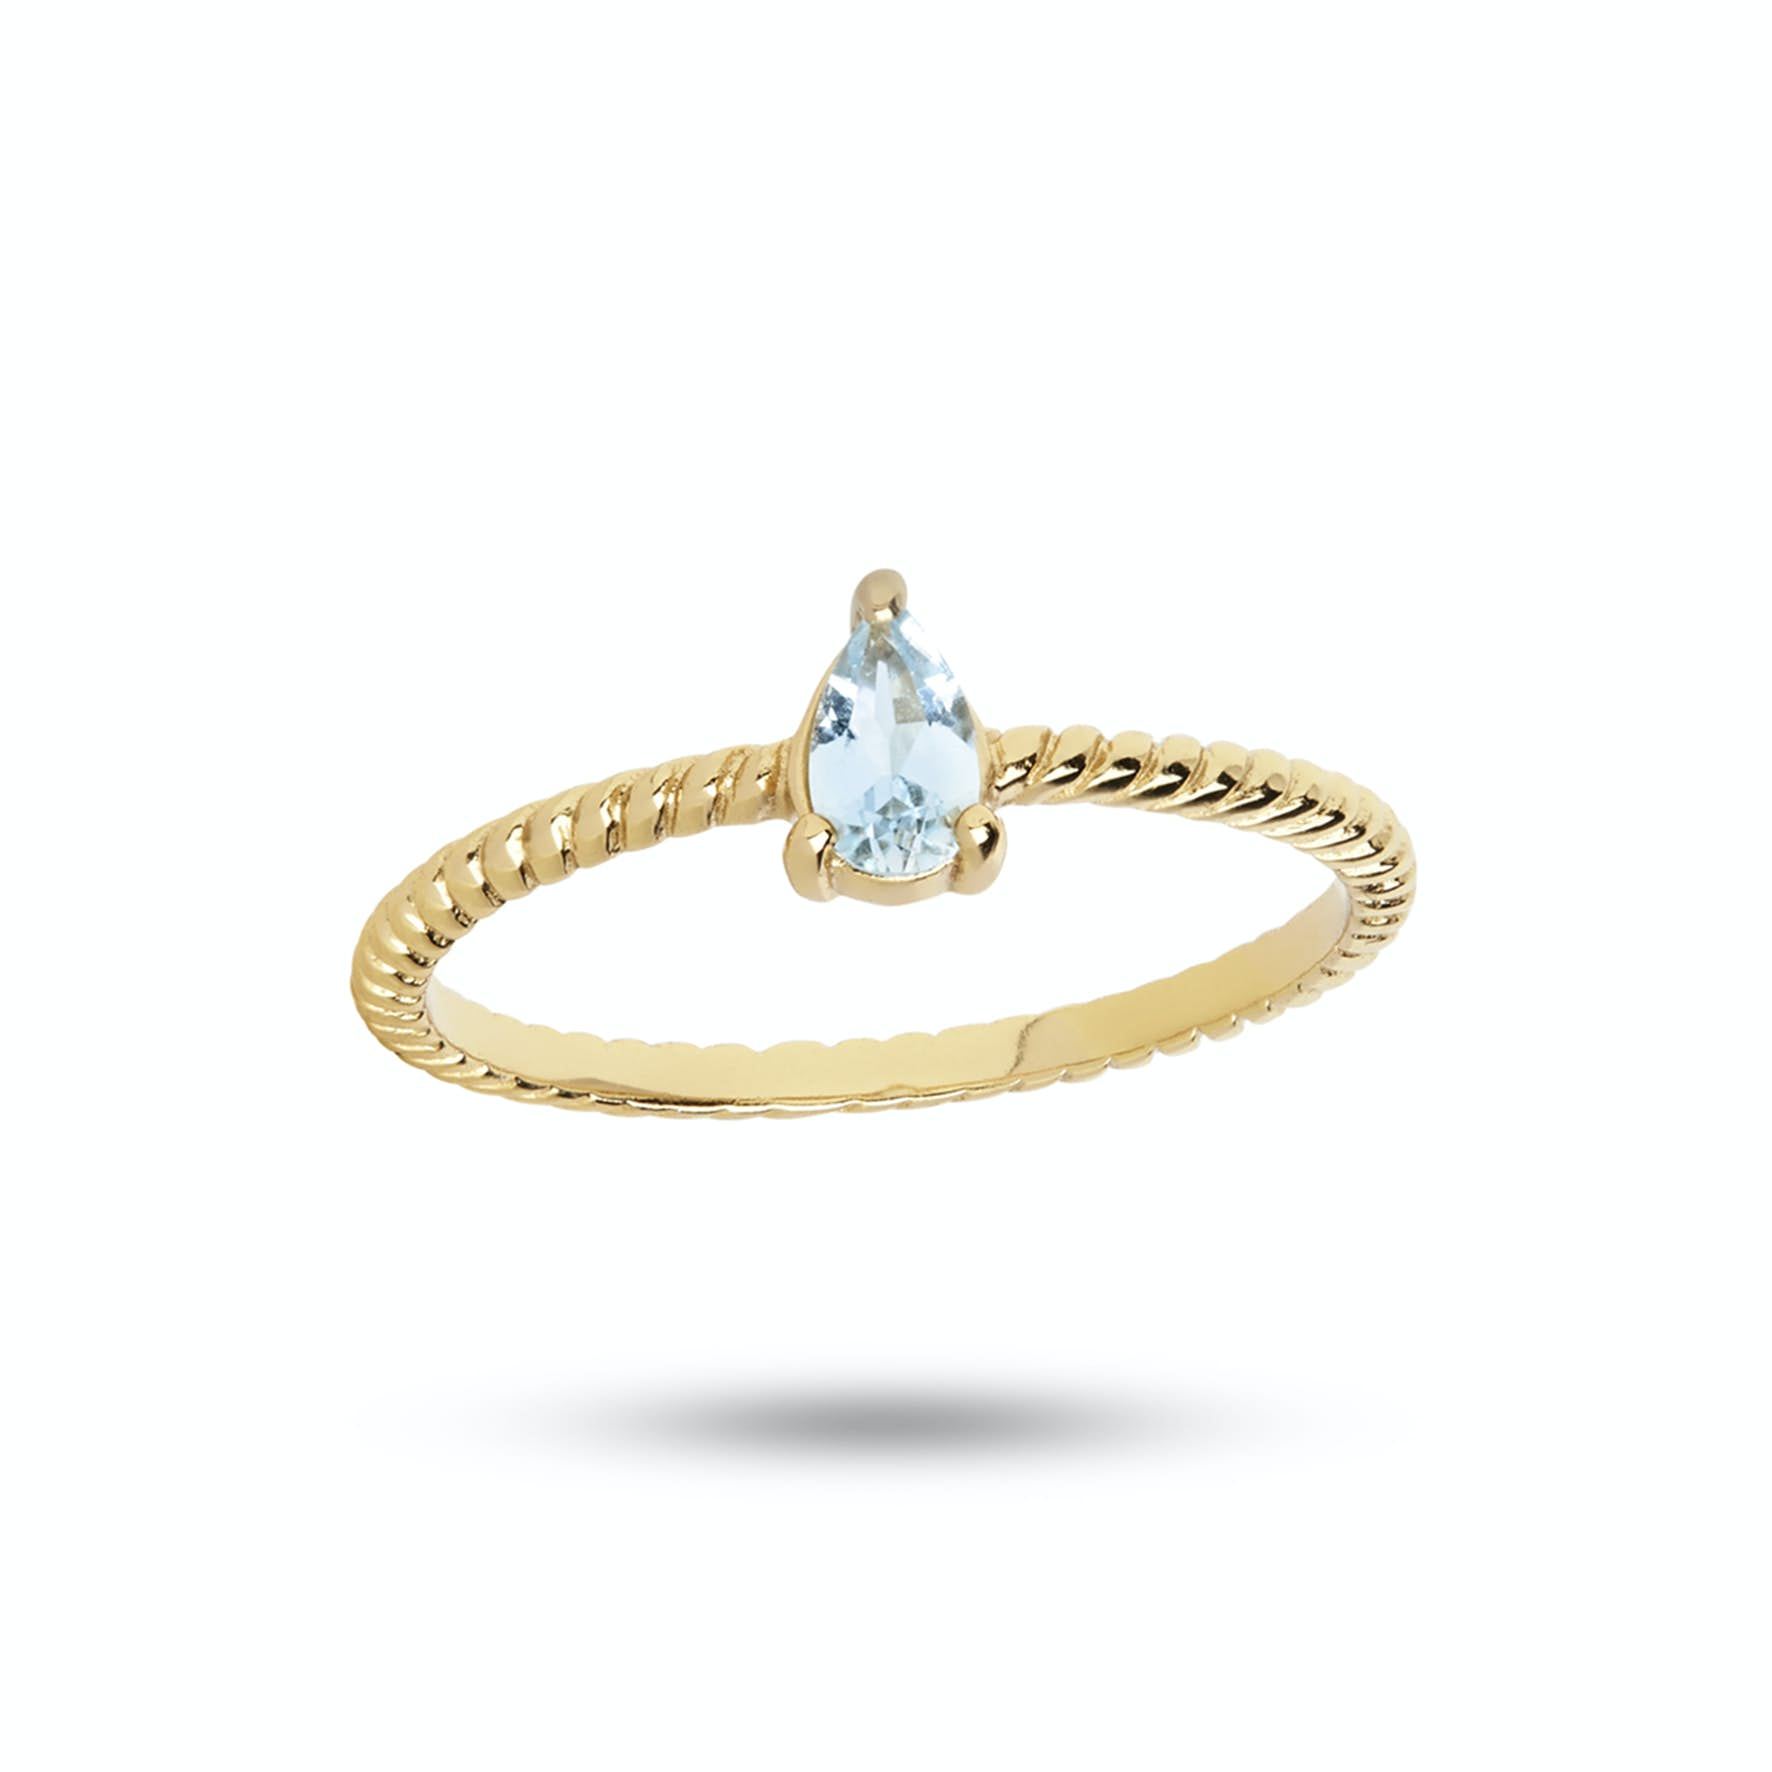 Gem Candy Ring Aqua von Carré in Vergoldet-Silber Sterling 925|